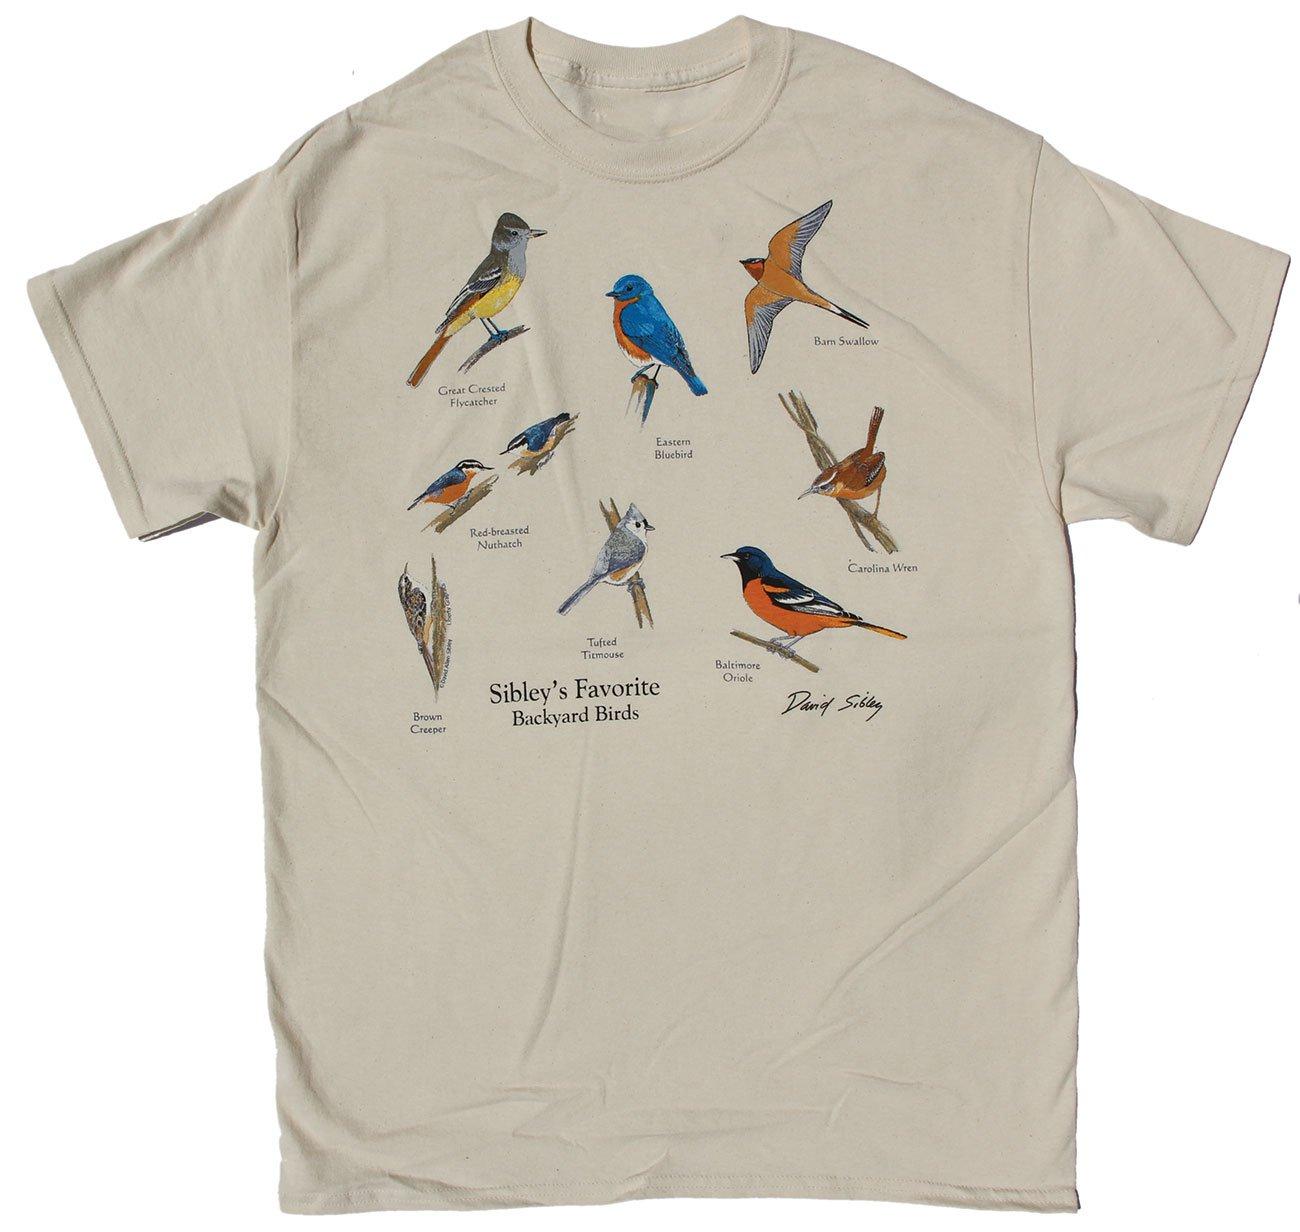 e29f8a141 Backyard Birds East t-shirt - Sibley Guides